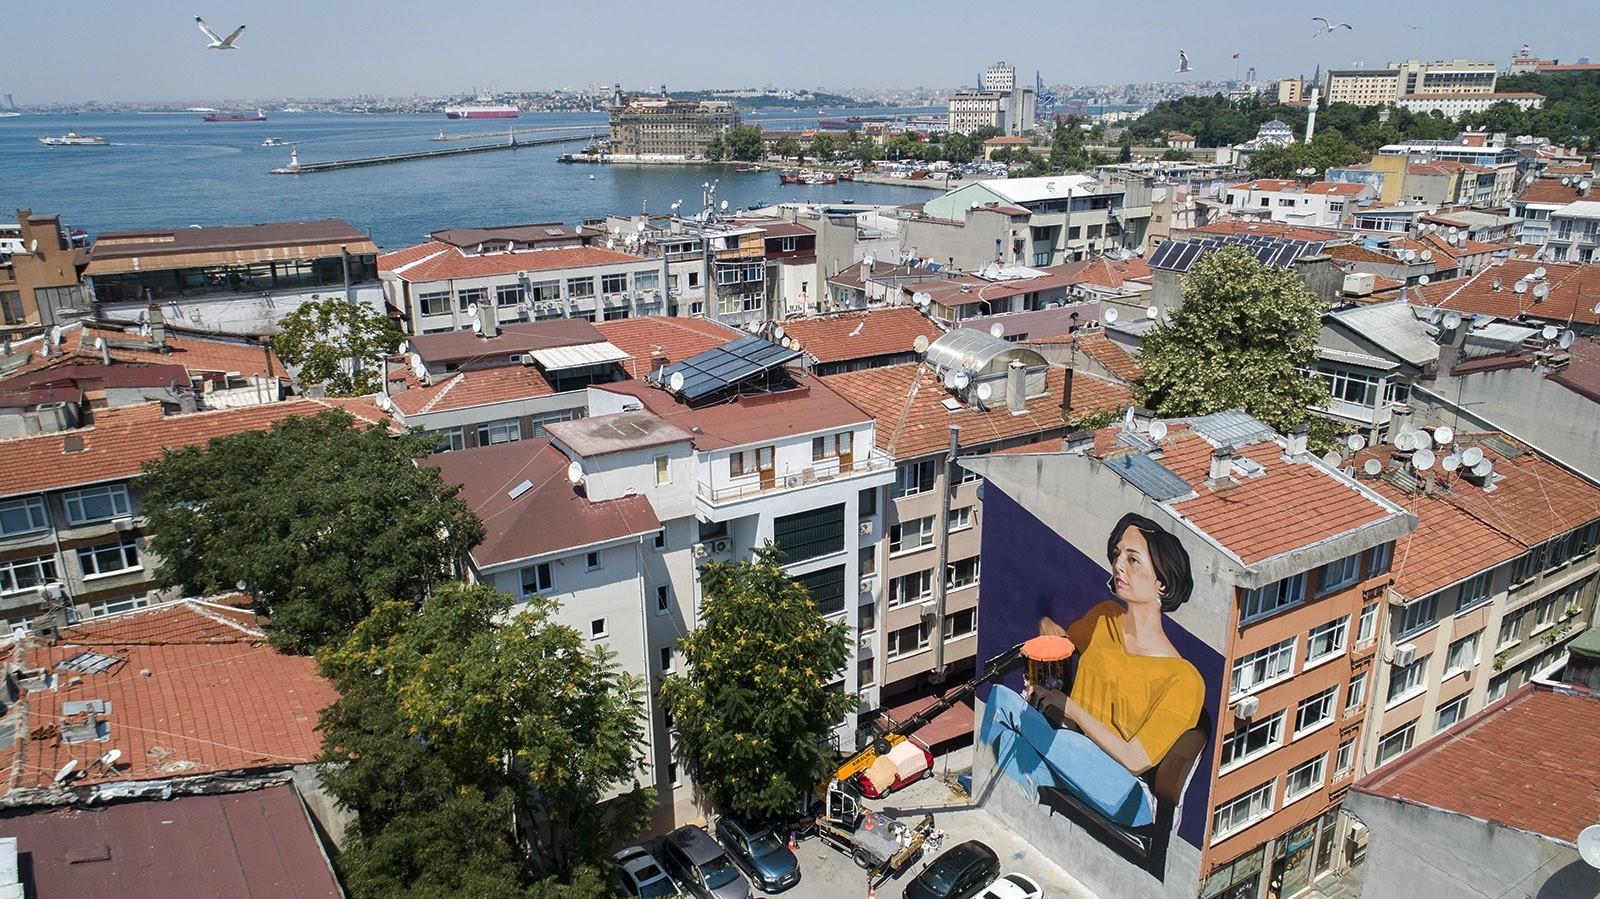 Giant murals embellish buildings in Istanbul's Kadıköy